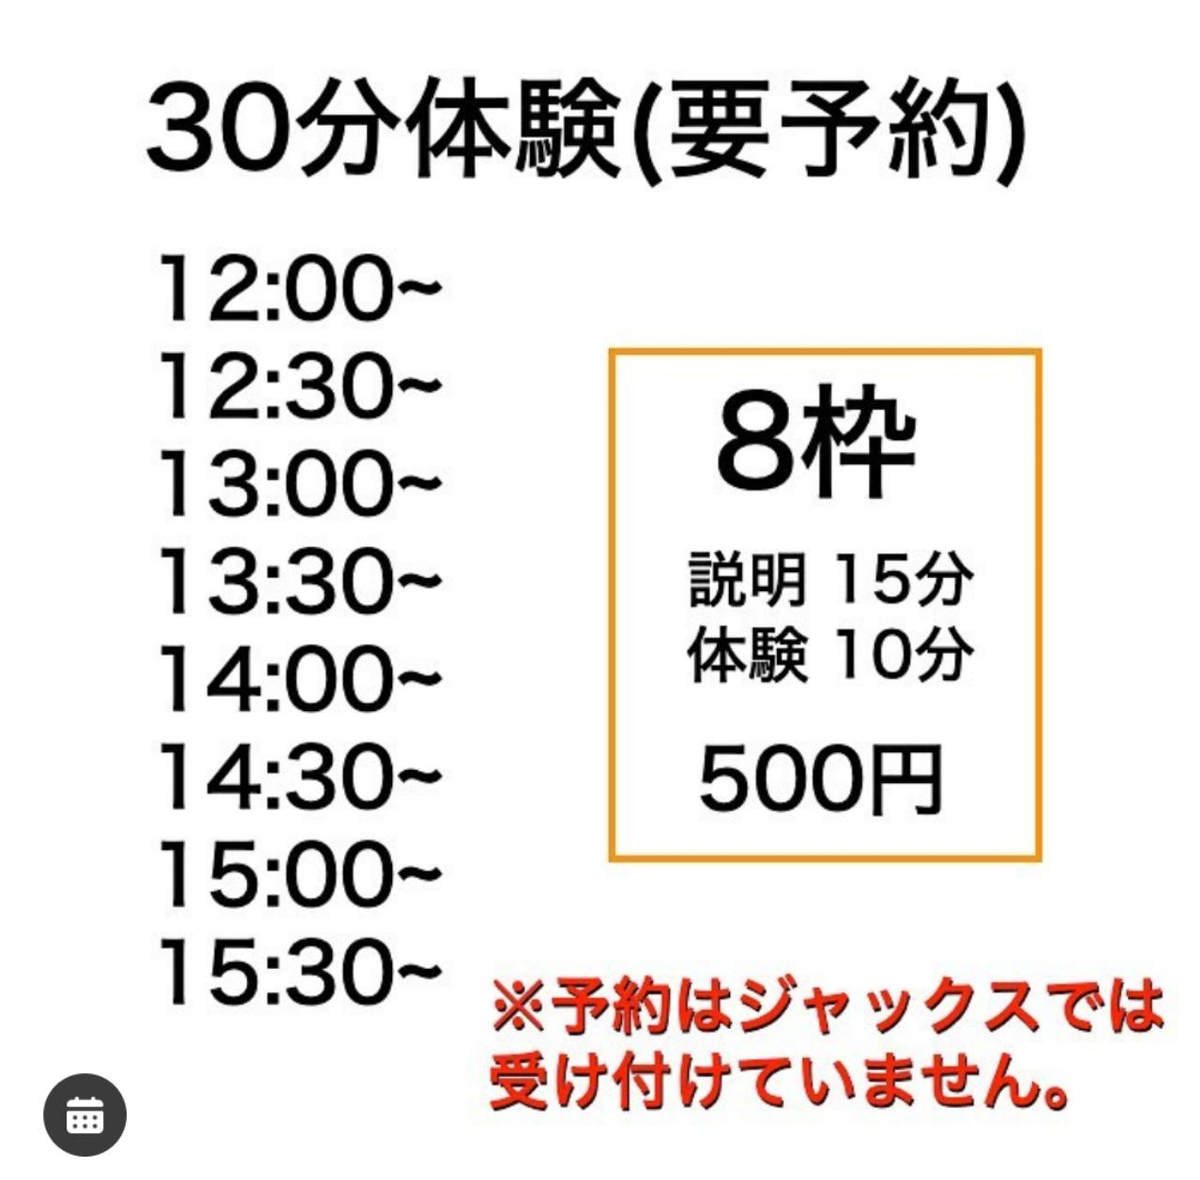 f:id:TETSUGAKUMAN:20210612145522p:plain